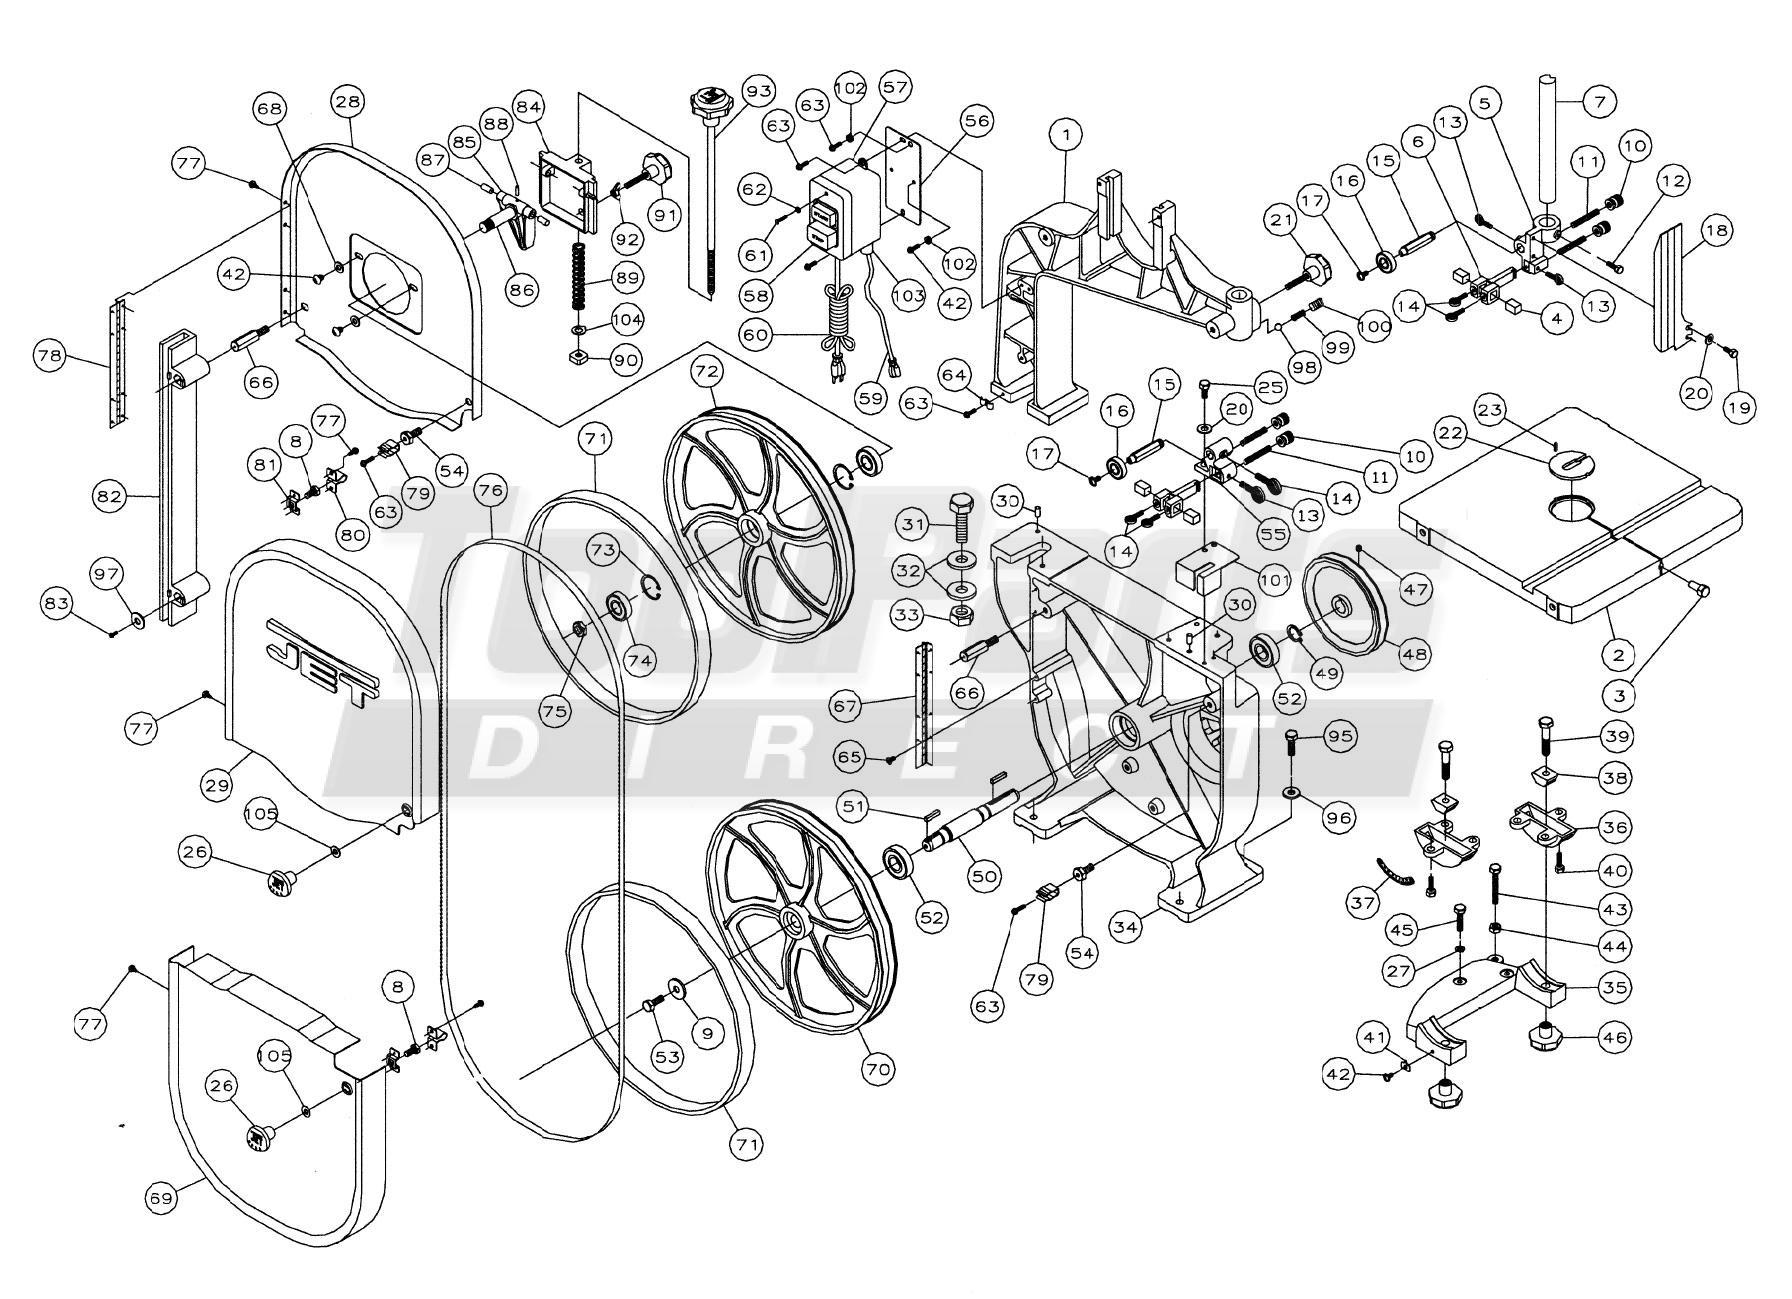 Ta 3555 Wiring Schematic 1980 Yamaha Sr250 Free Diagram